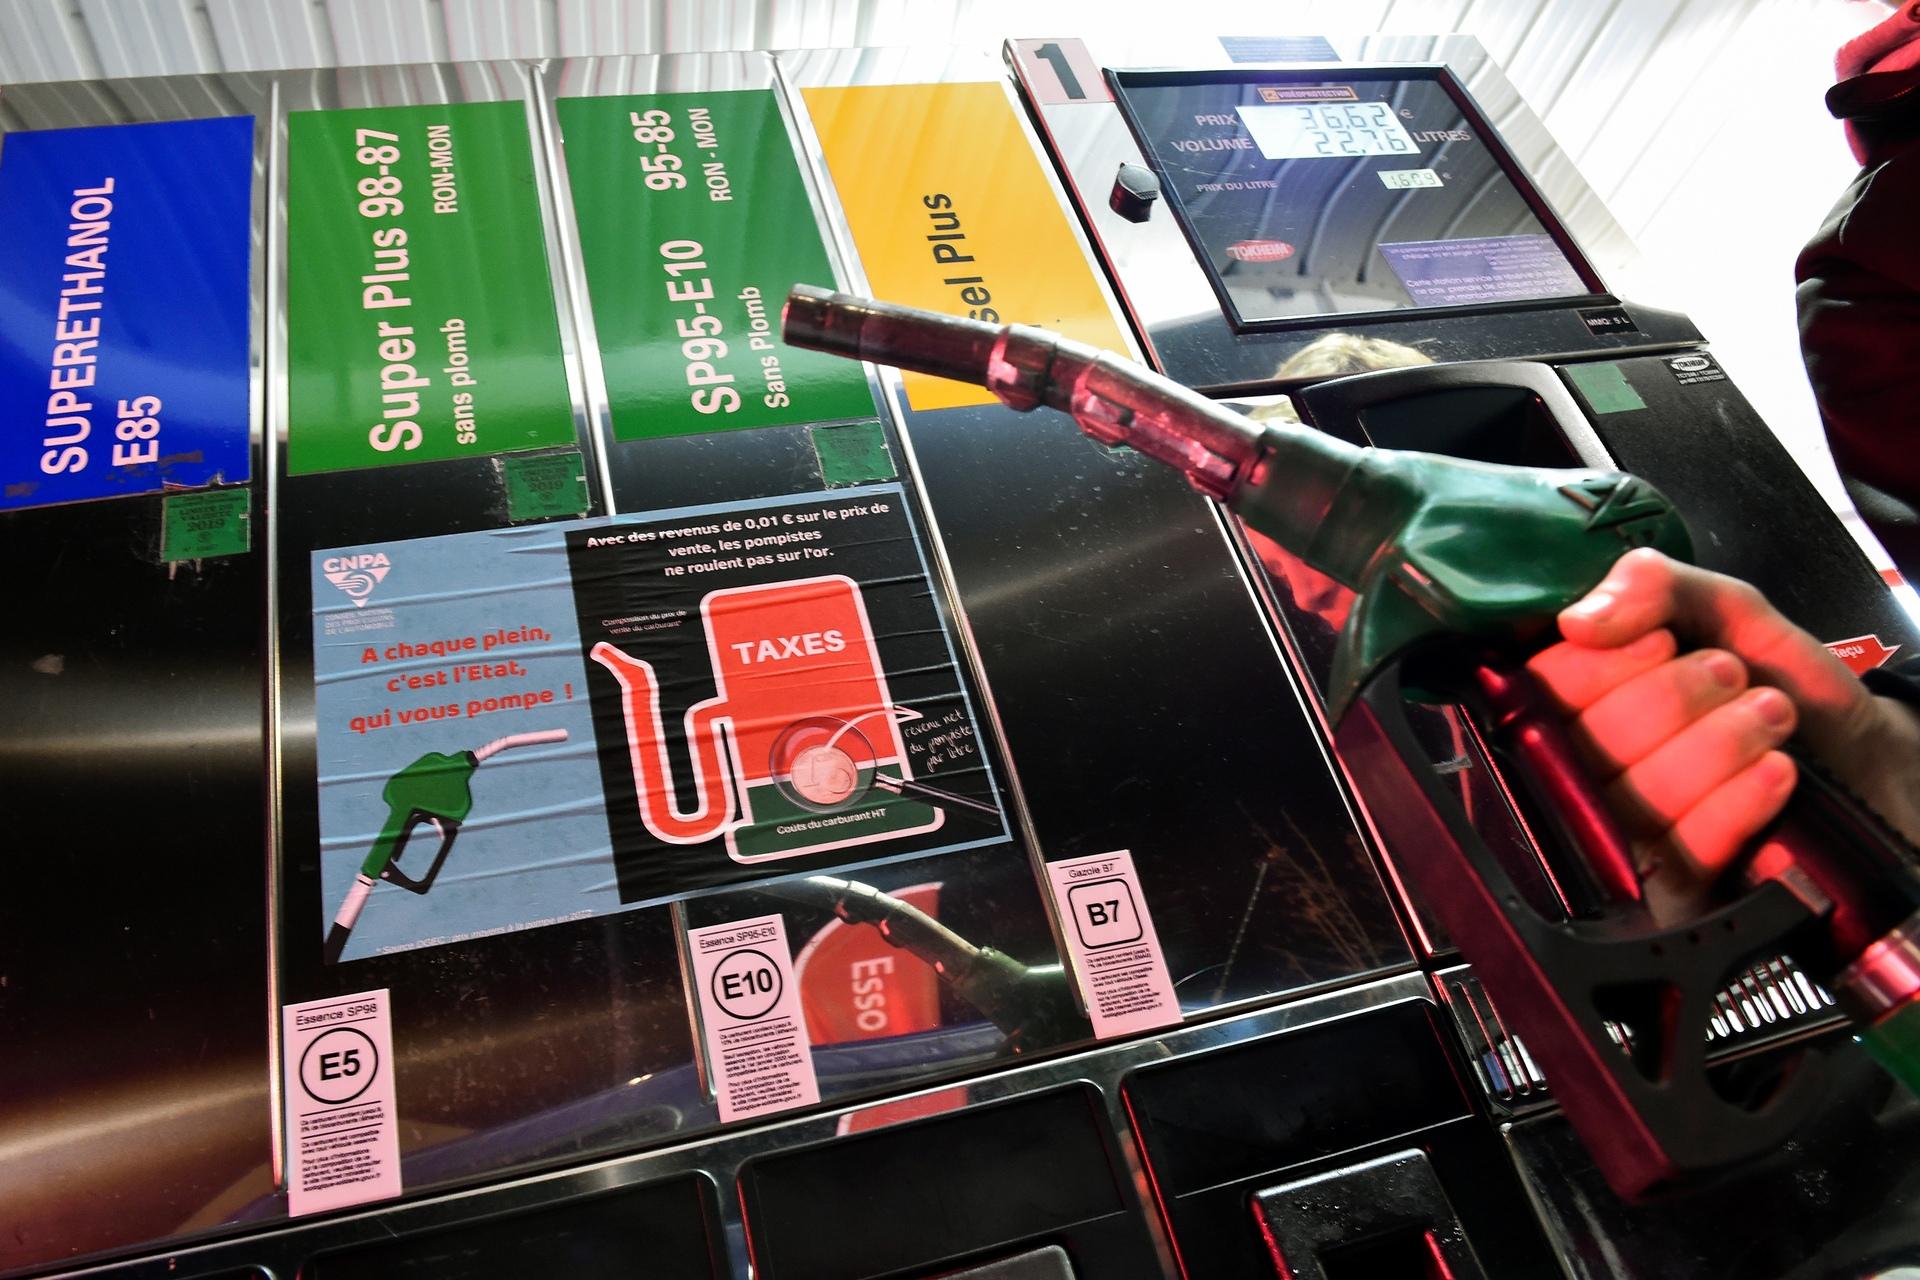 Carburant :Le prix du SP98 grimpe ce samedi au Luxembourg